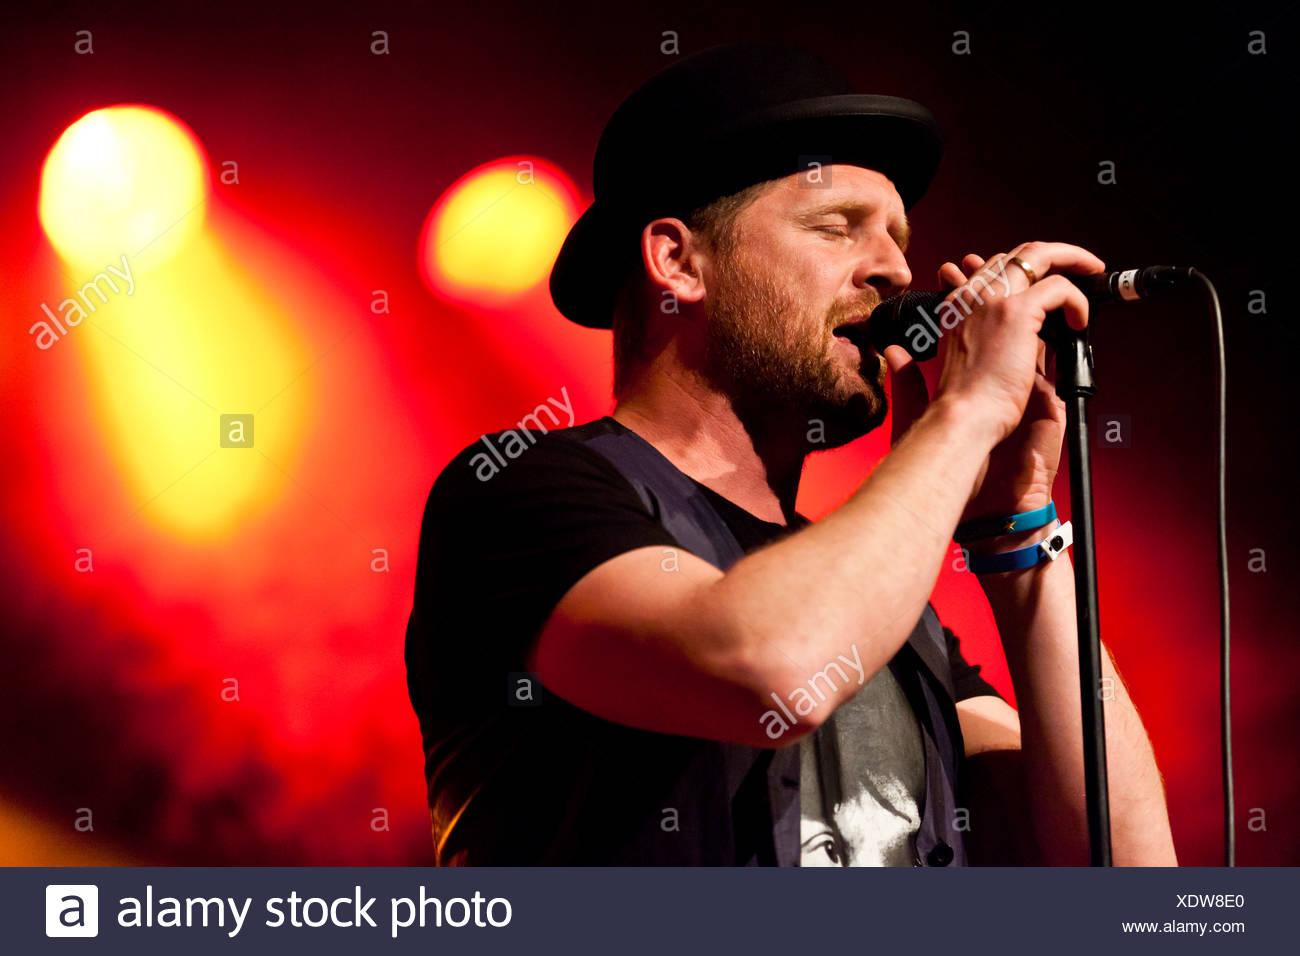 Bart van der Weide, singer of the Dutch band Racoon, performing live in the Schueuer concert hall, Lucerne, Switzerland, Europe - Stock Image